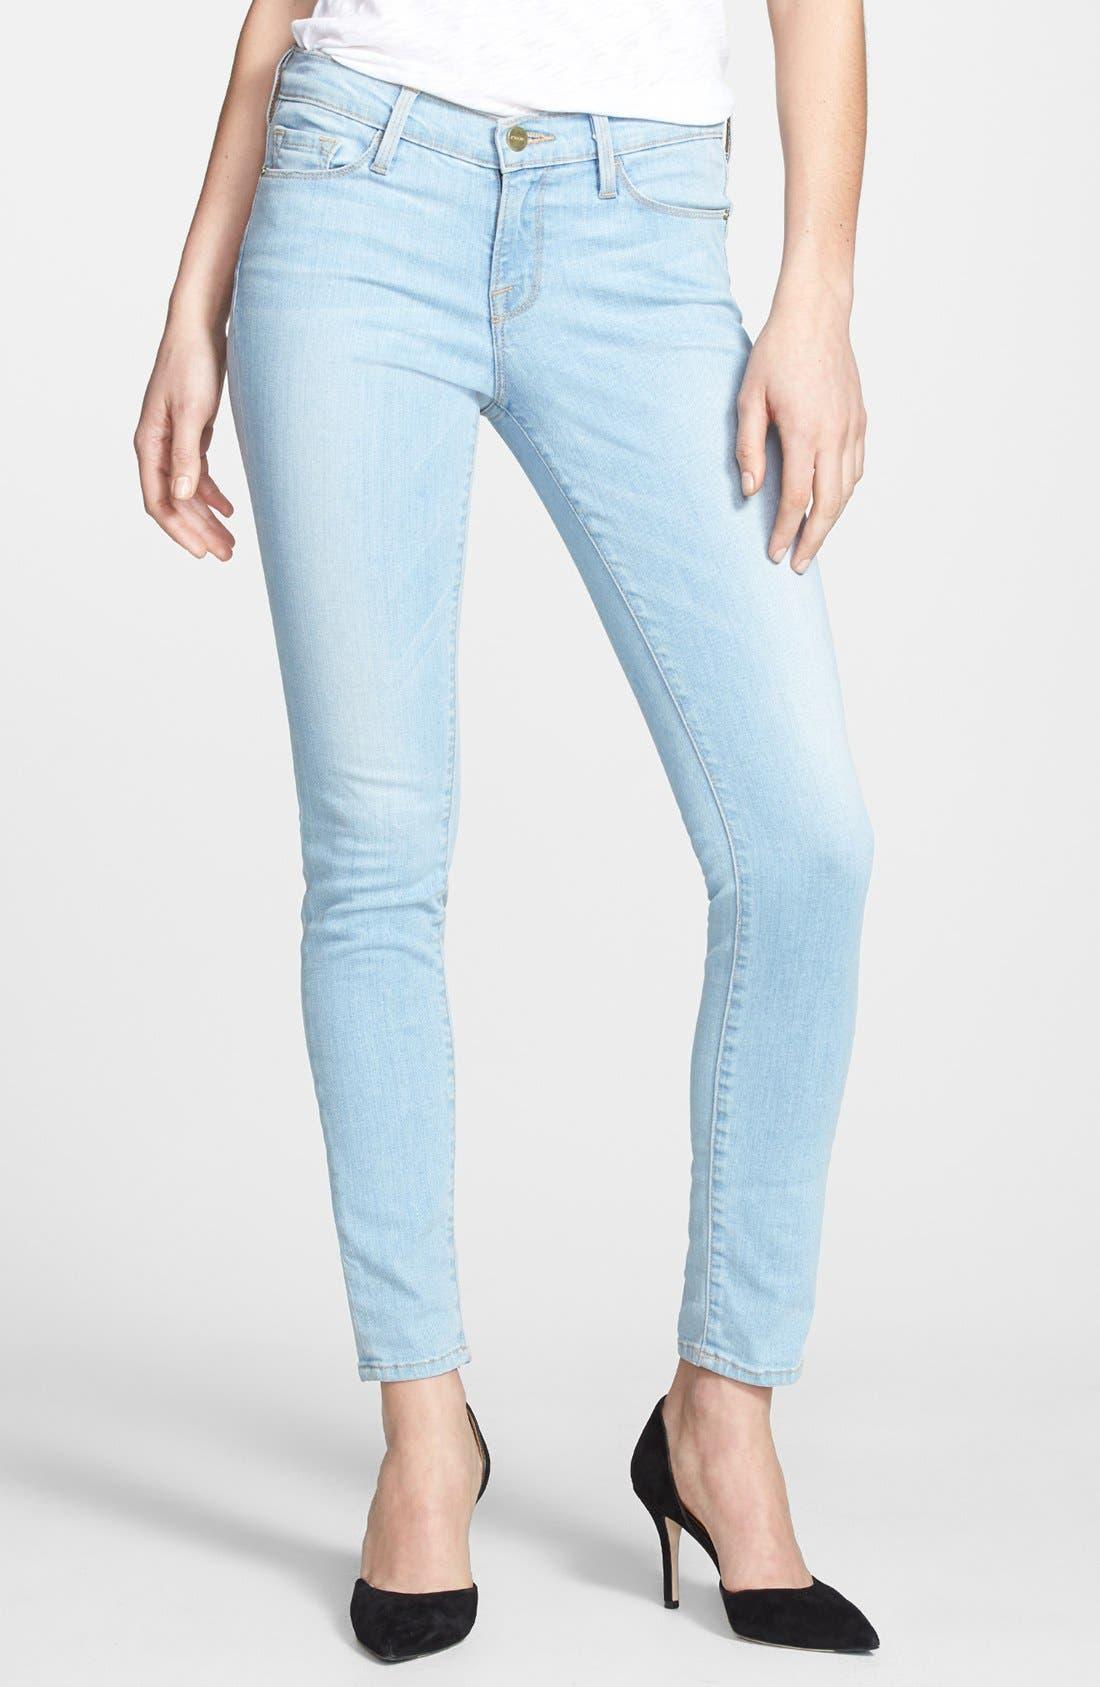 Alternate Image 3  - Frame Denim 'Le Skinny de Jeanne' Jeans (Redchurch Street)